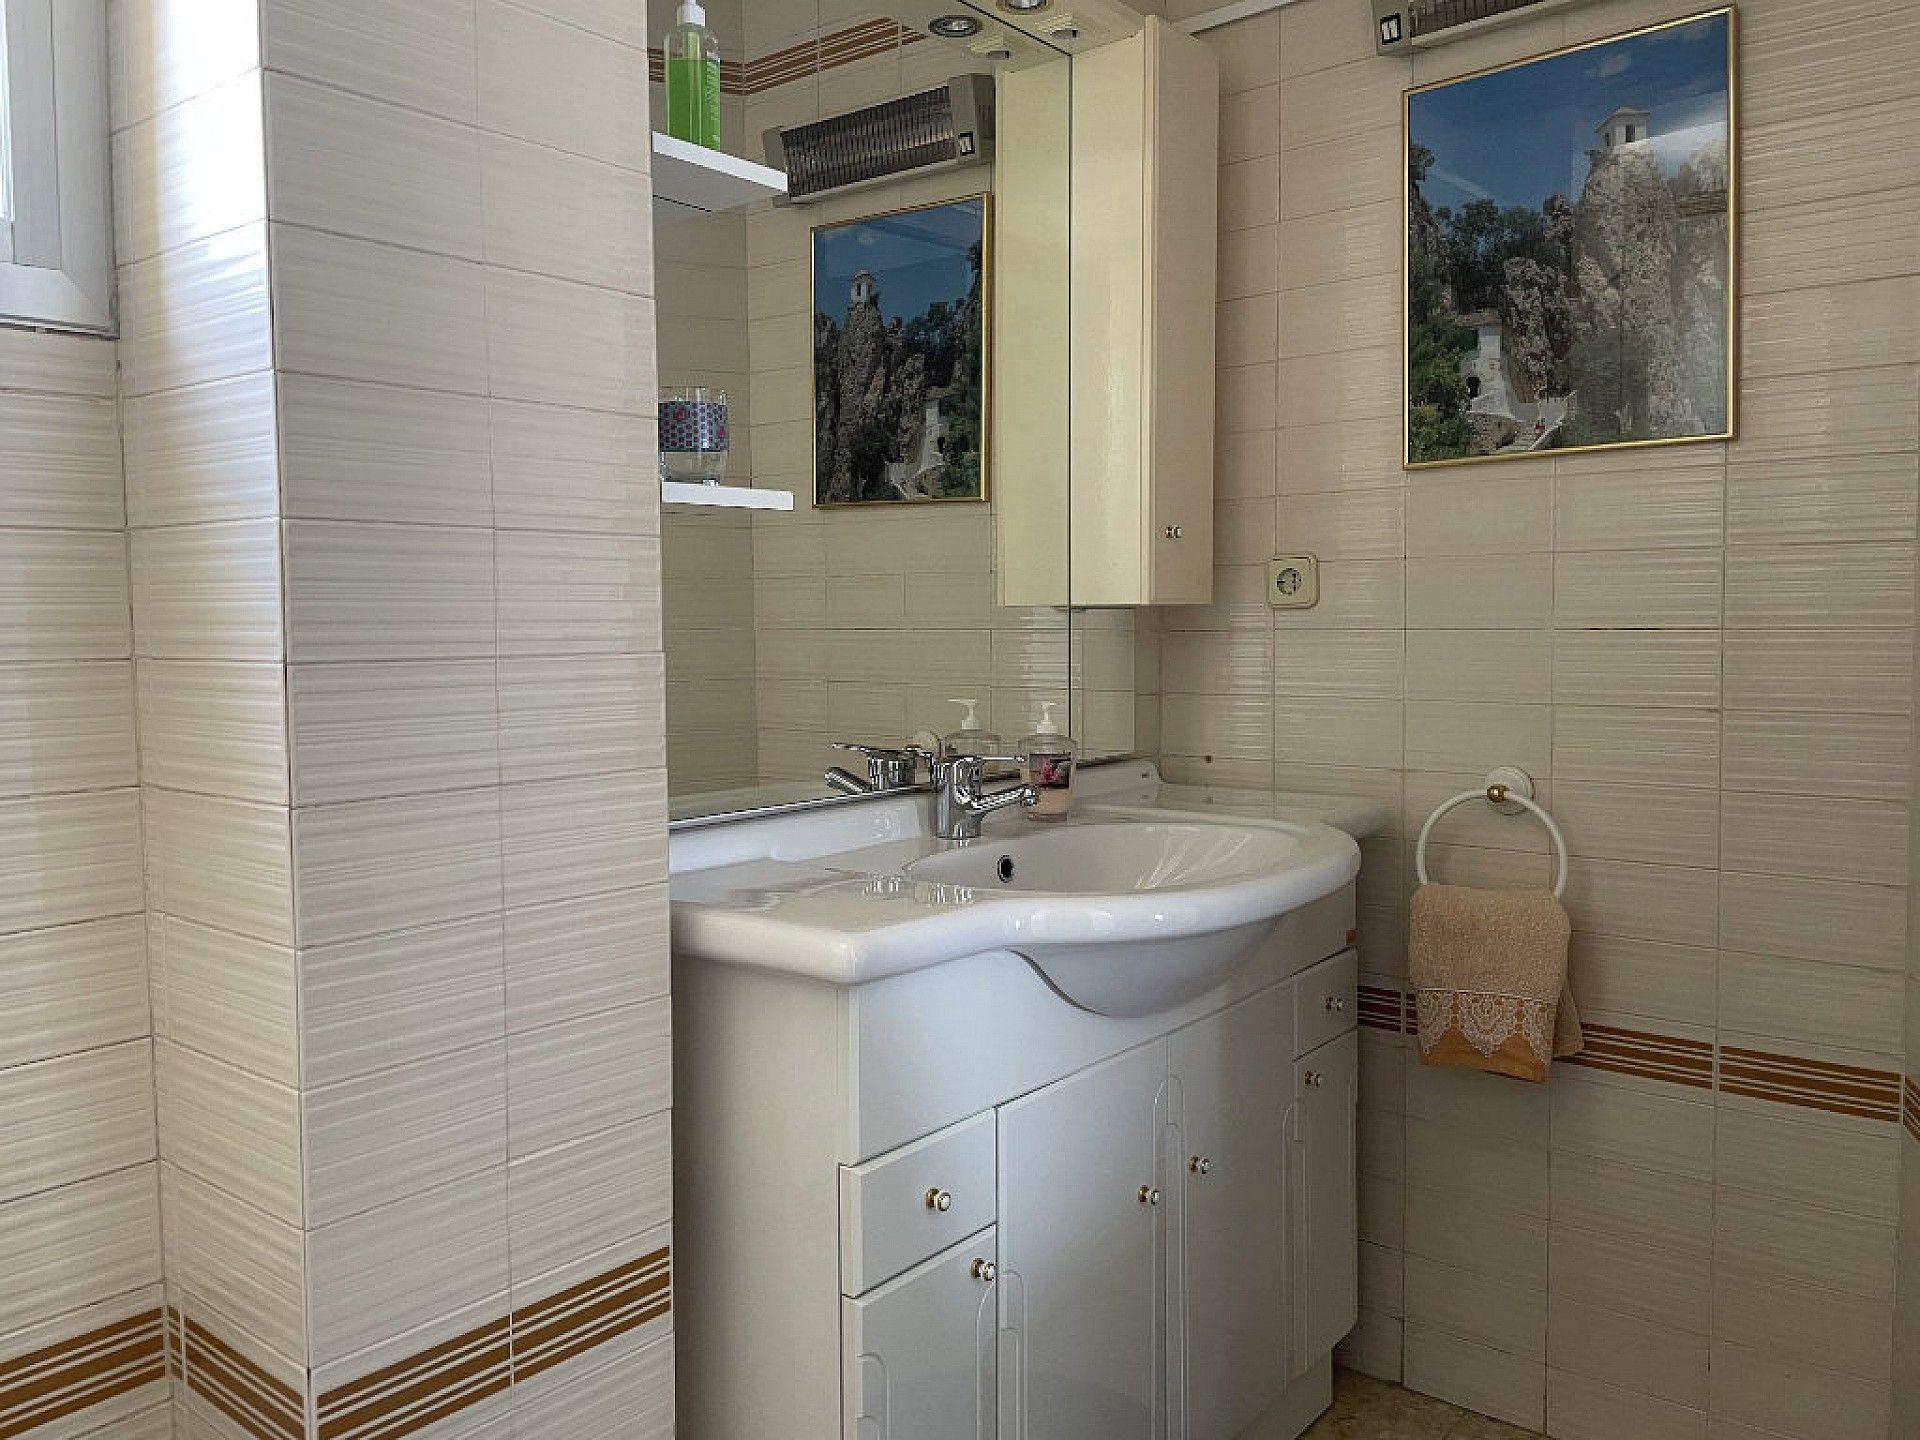 w_appartement-tekoop-costa-blanca-calpe-a1068-spanje14.jpg